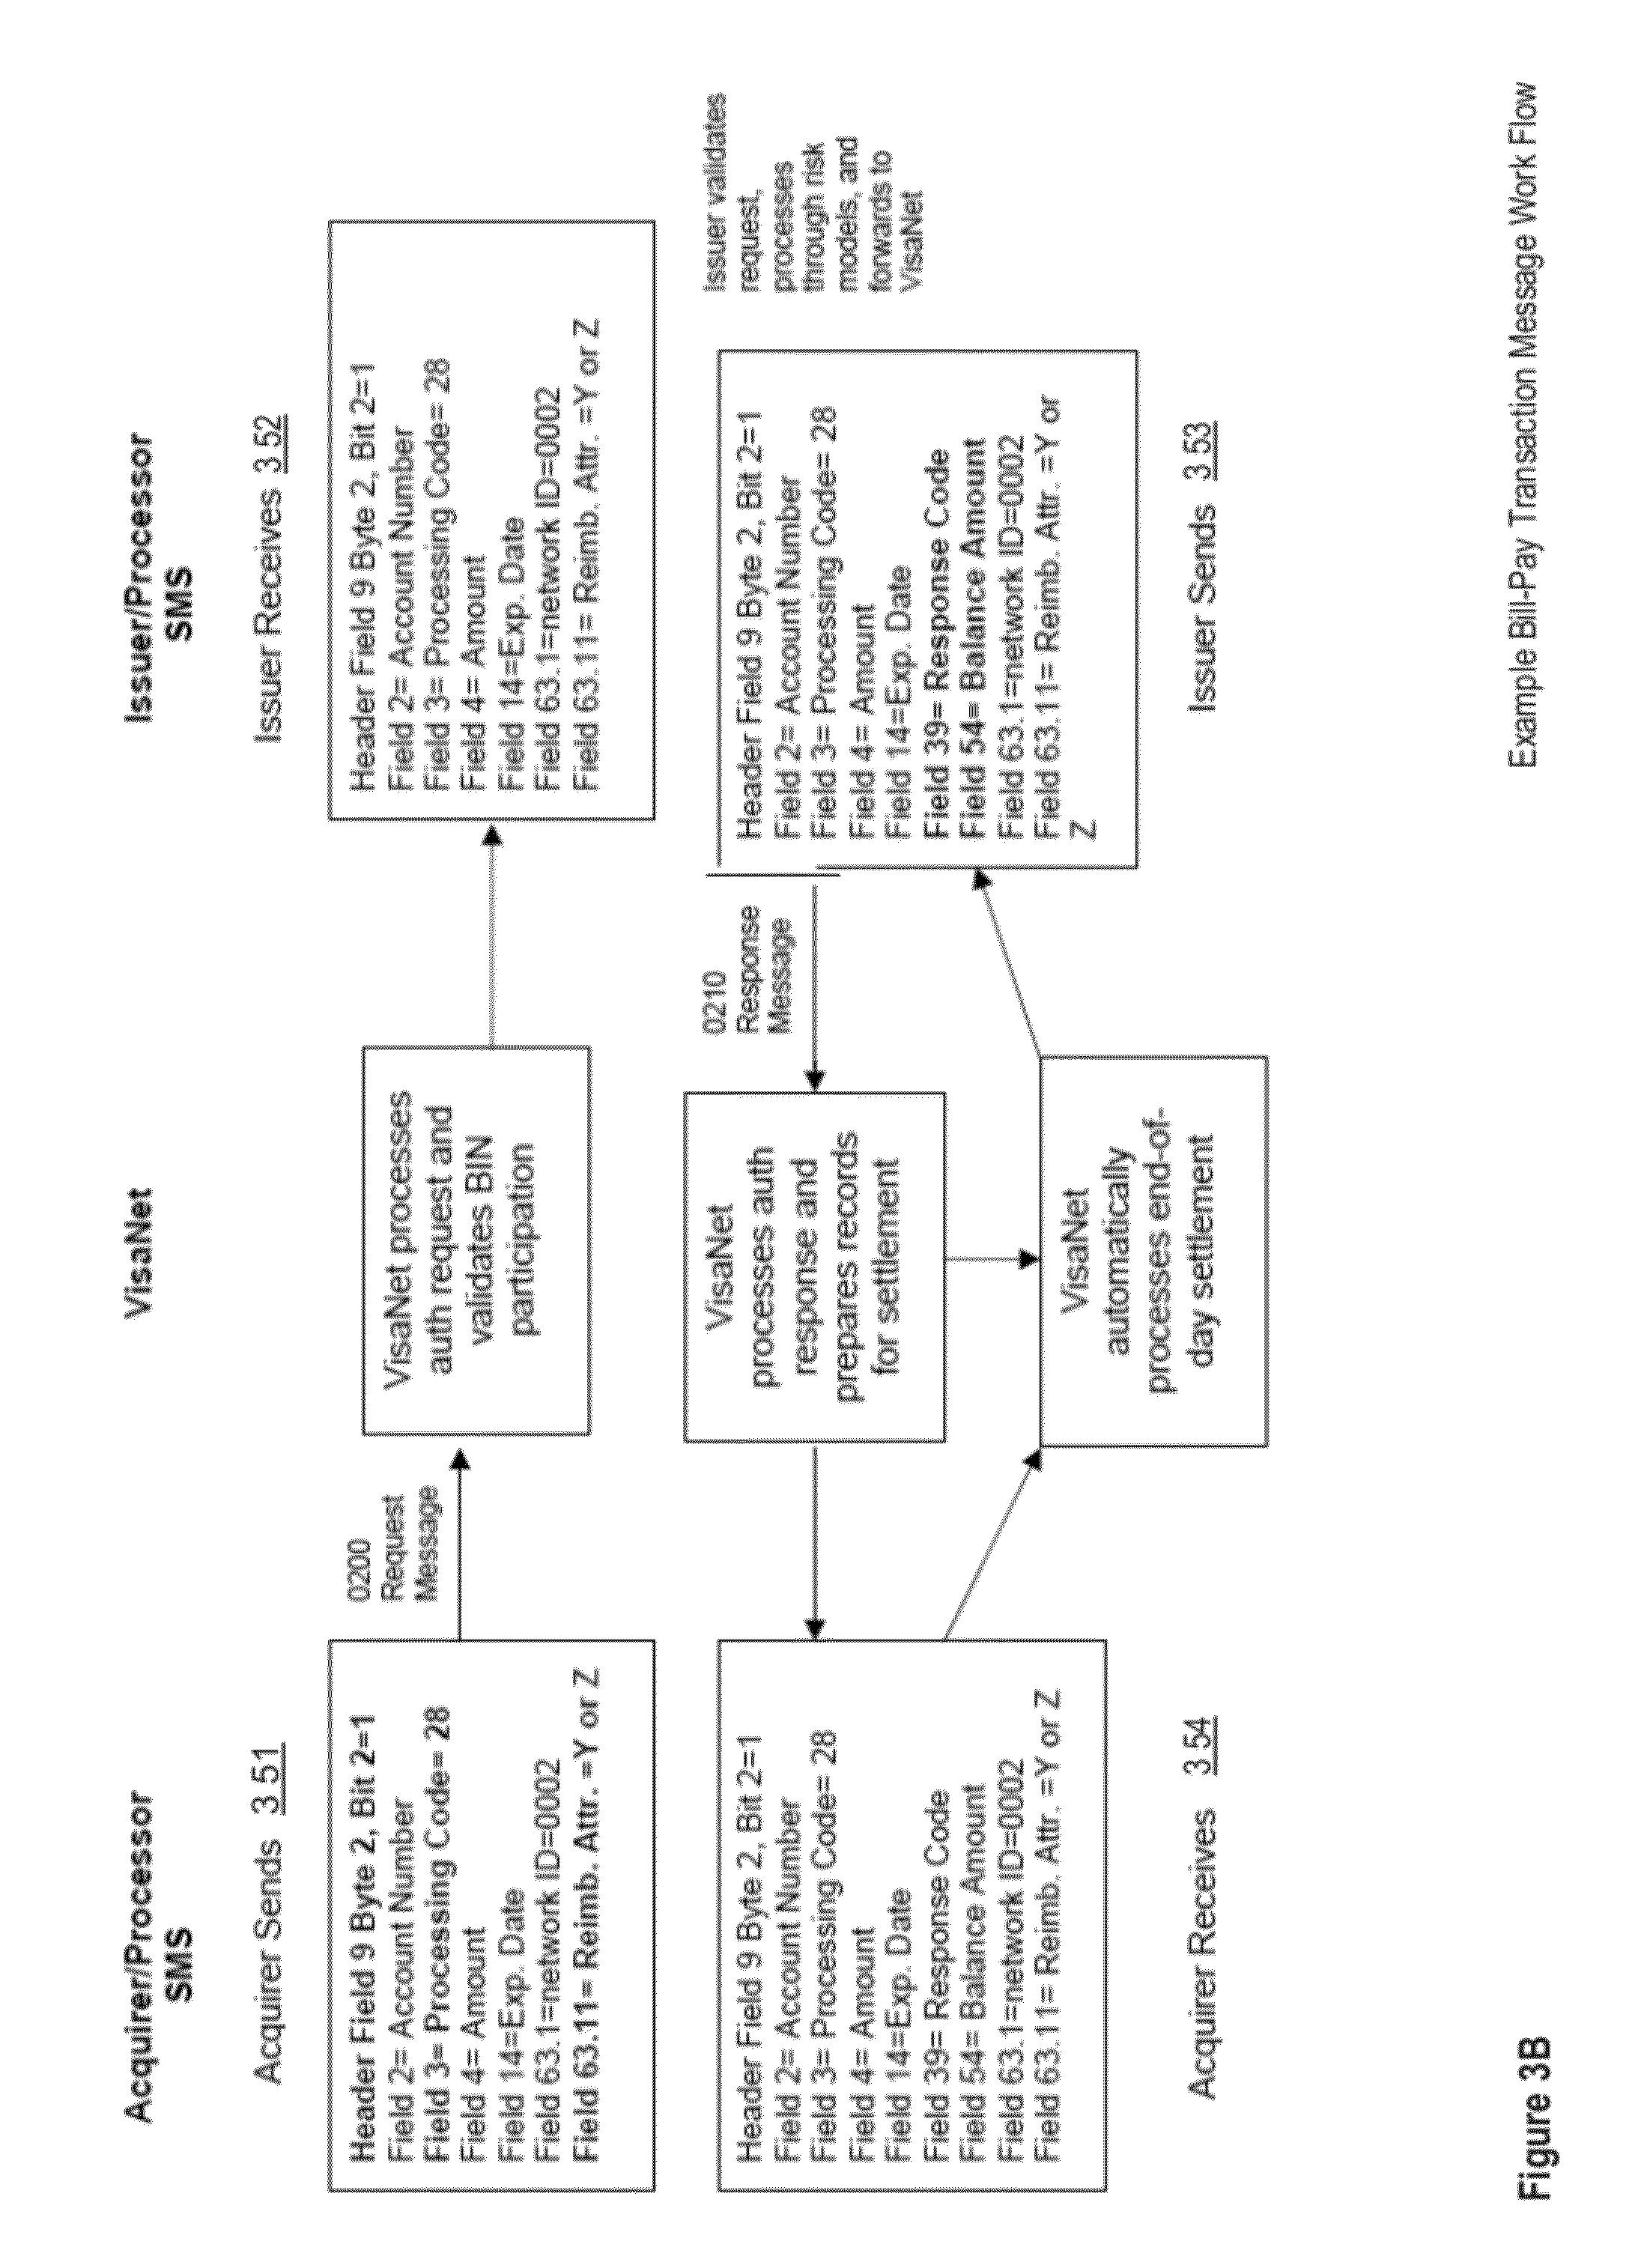 Patent US 20120136780A1